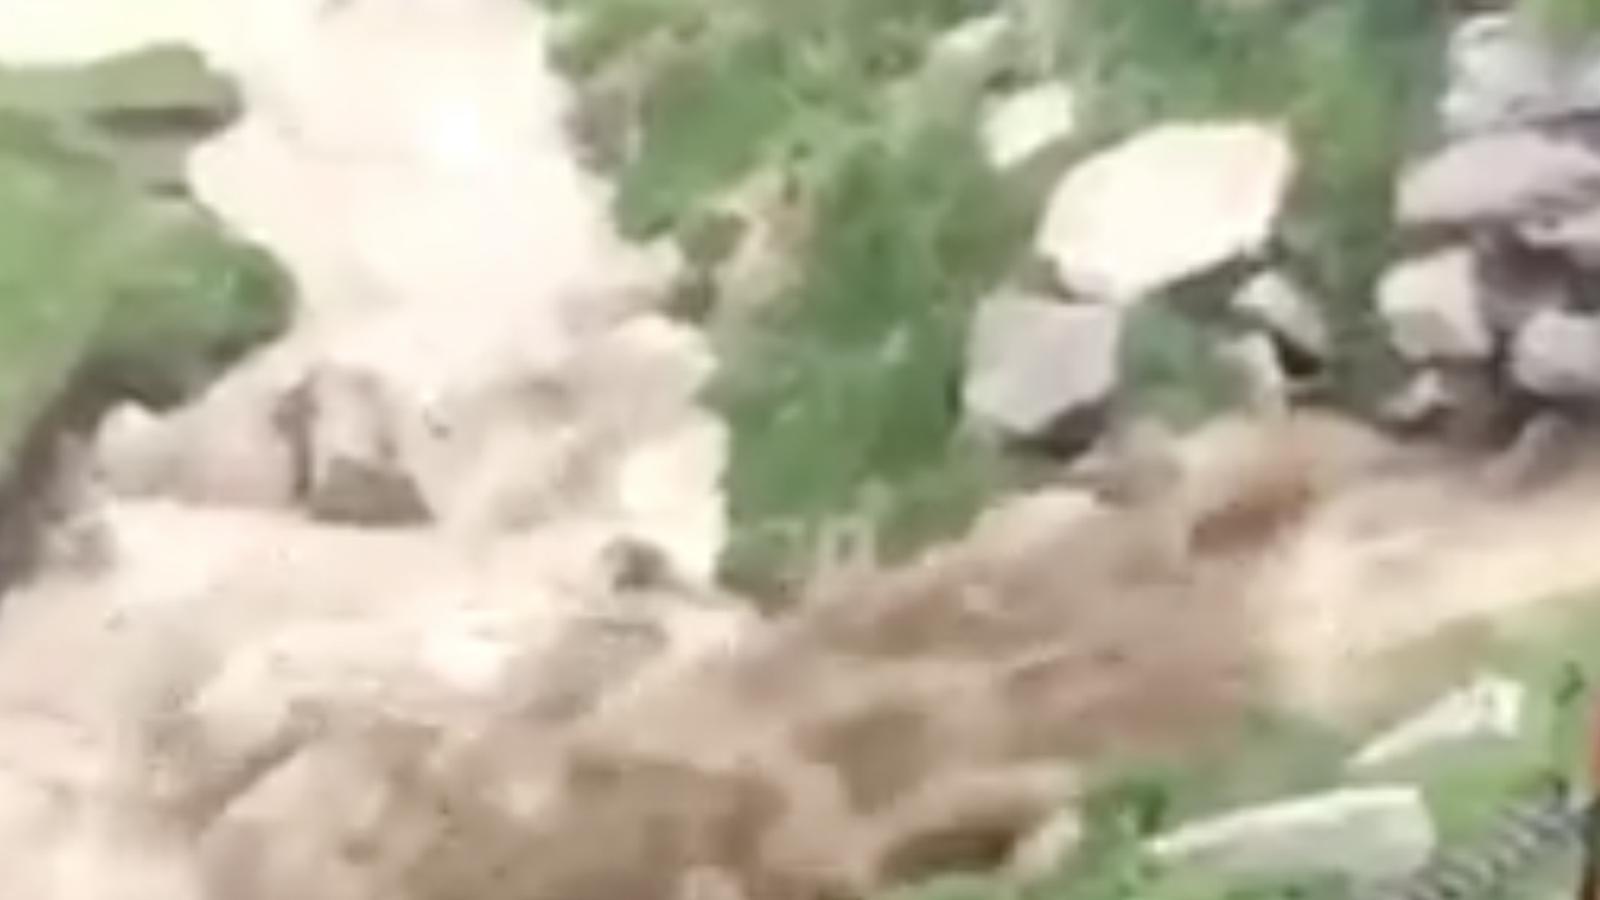 Inundacions al Pas de la Casa